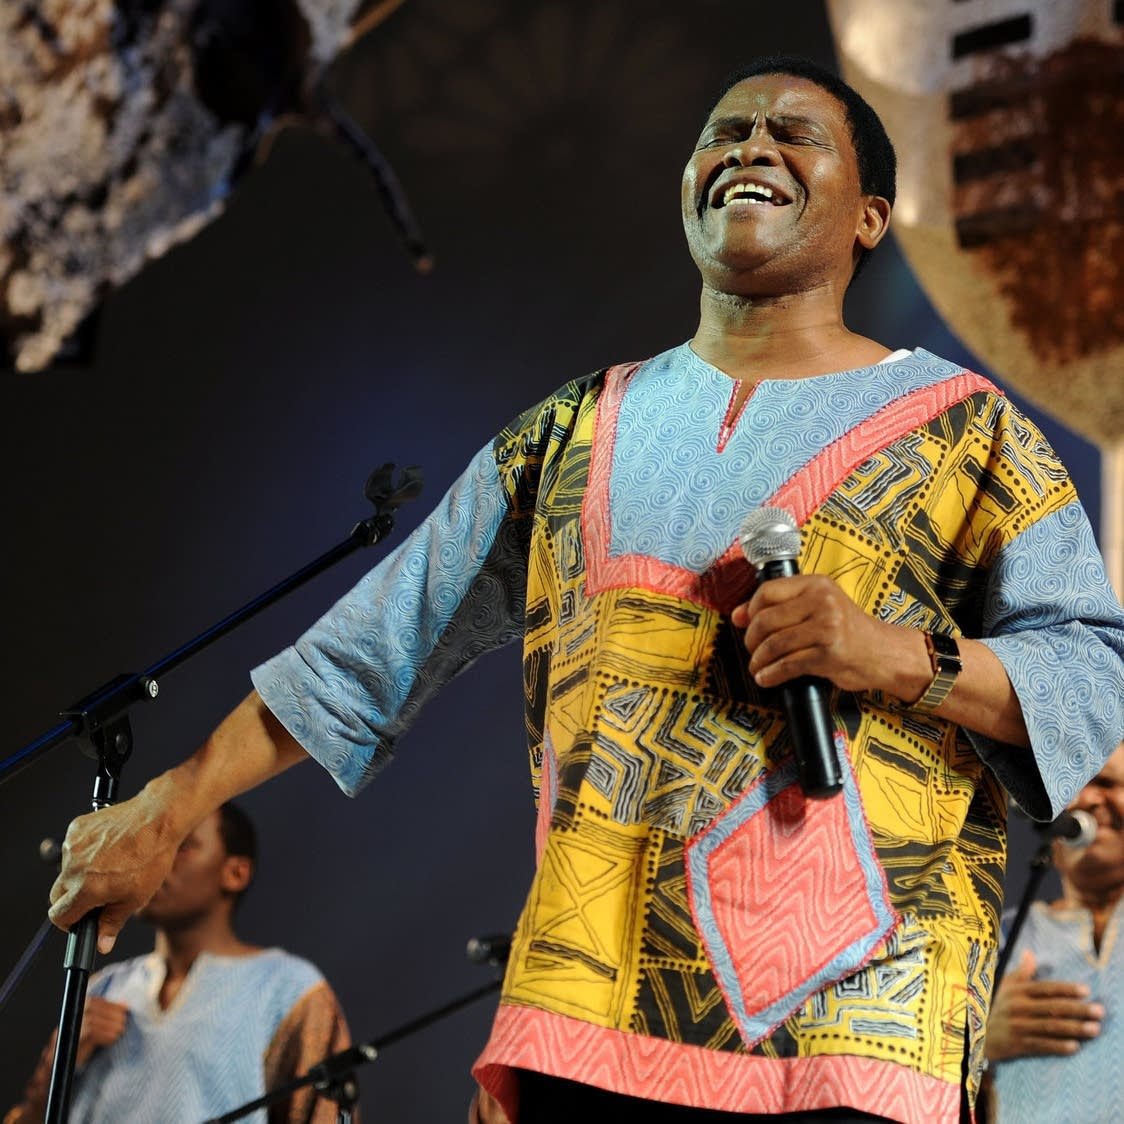 Joseph Shabala leads Ladysmith Black Mambazo in performance